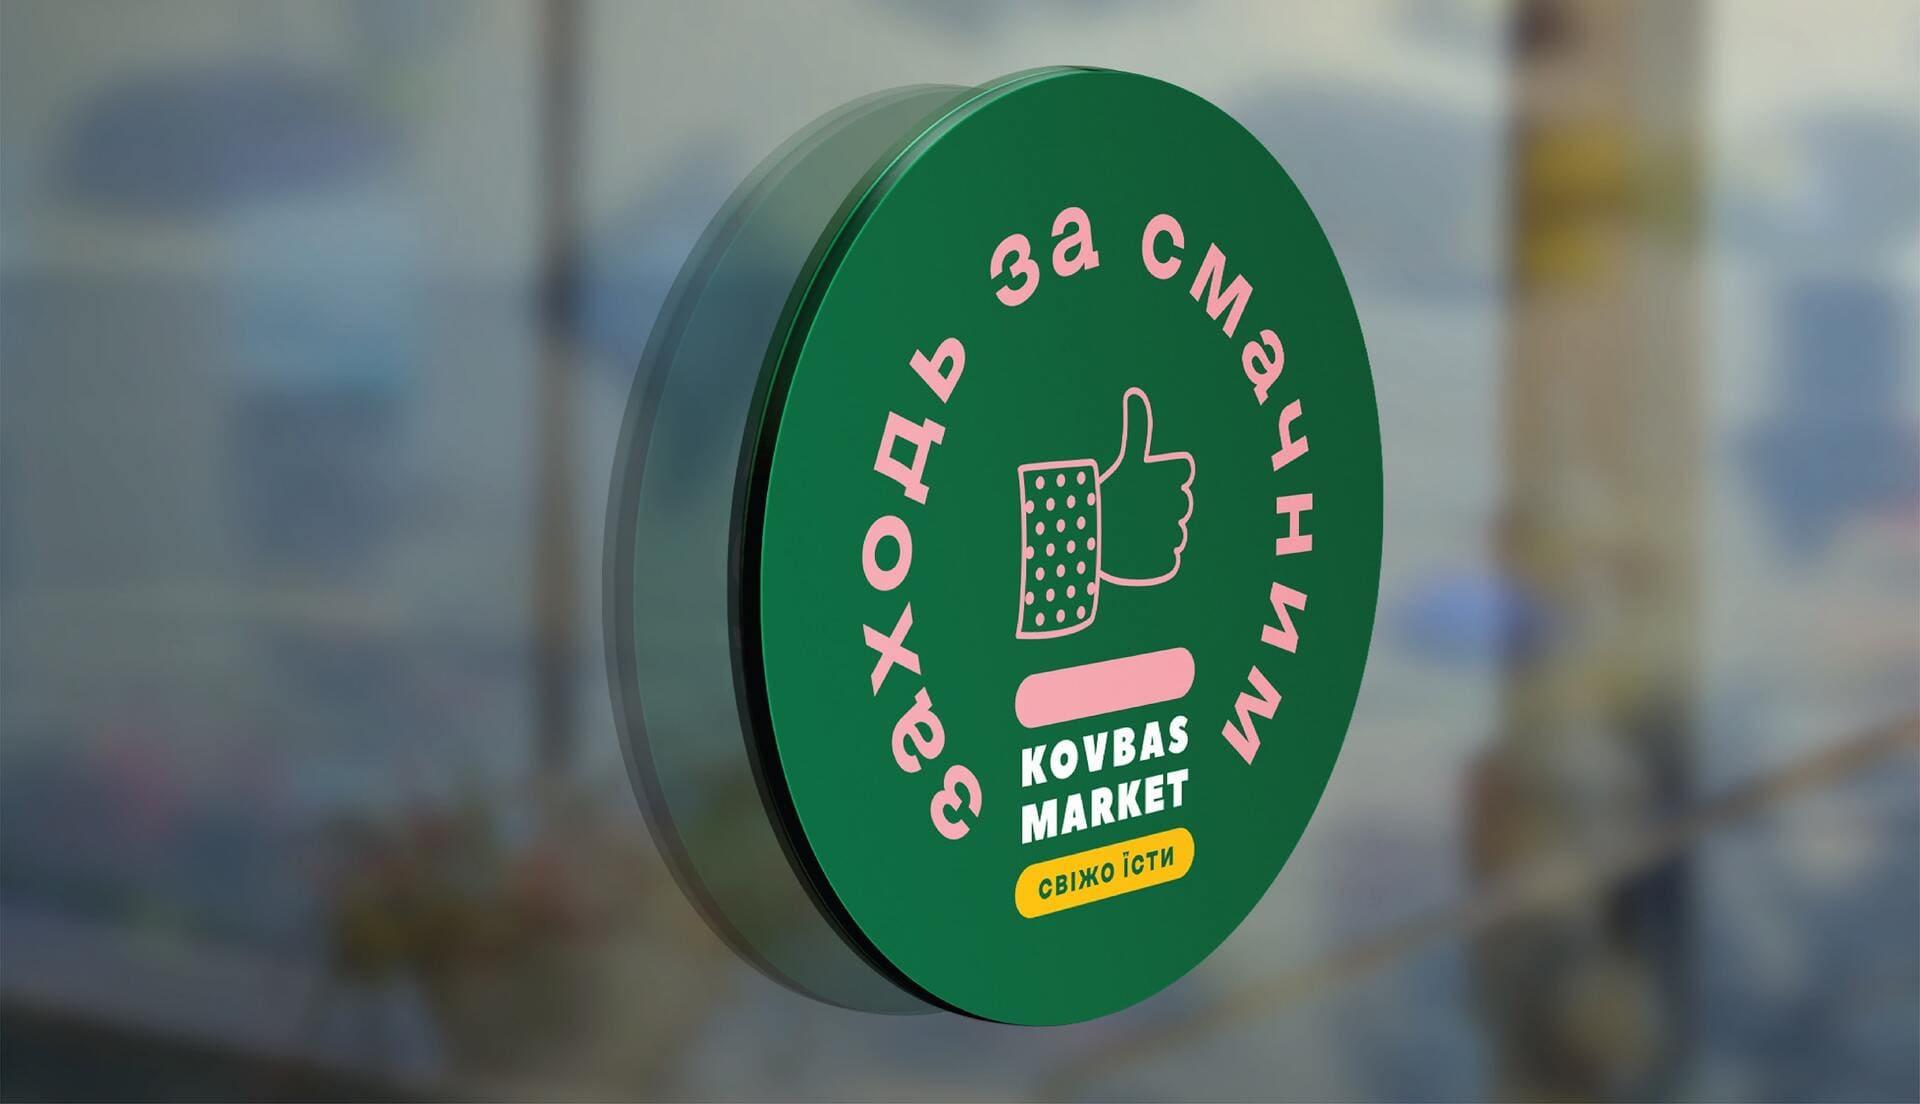 gra brand design kovbas market 3